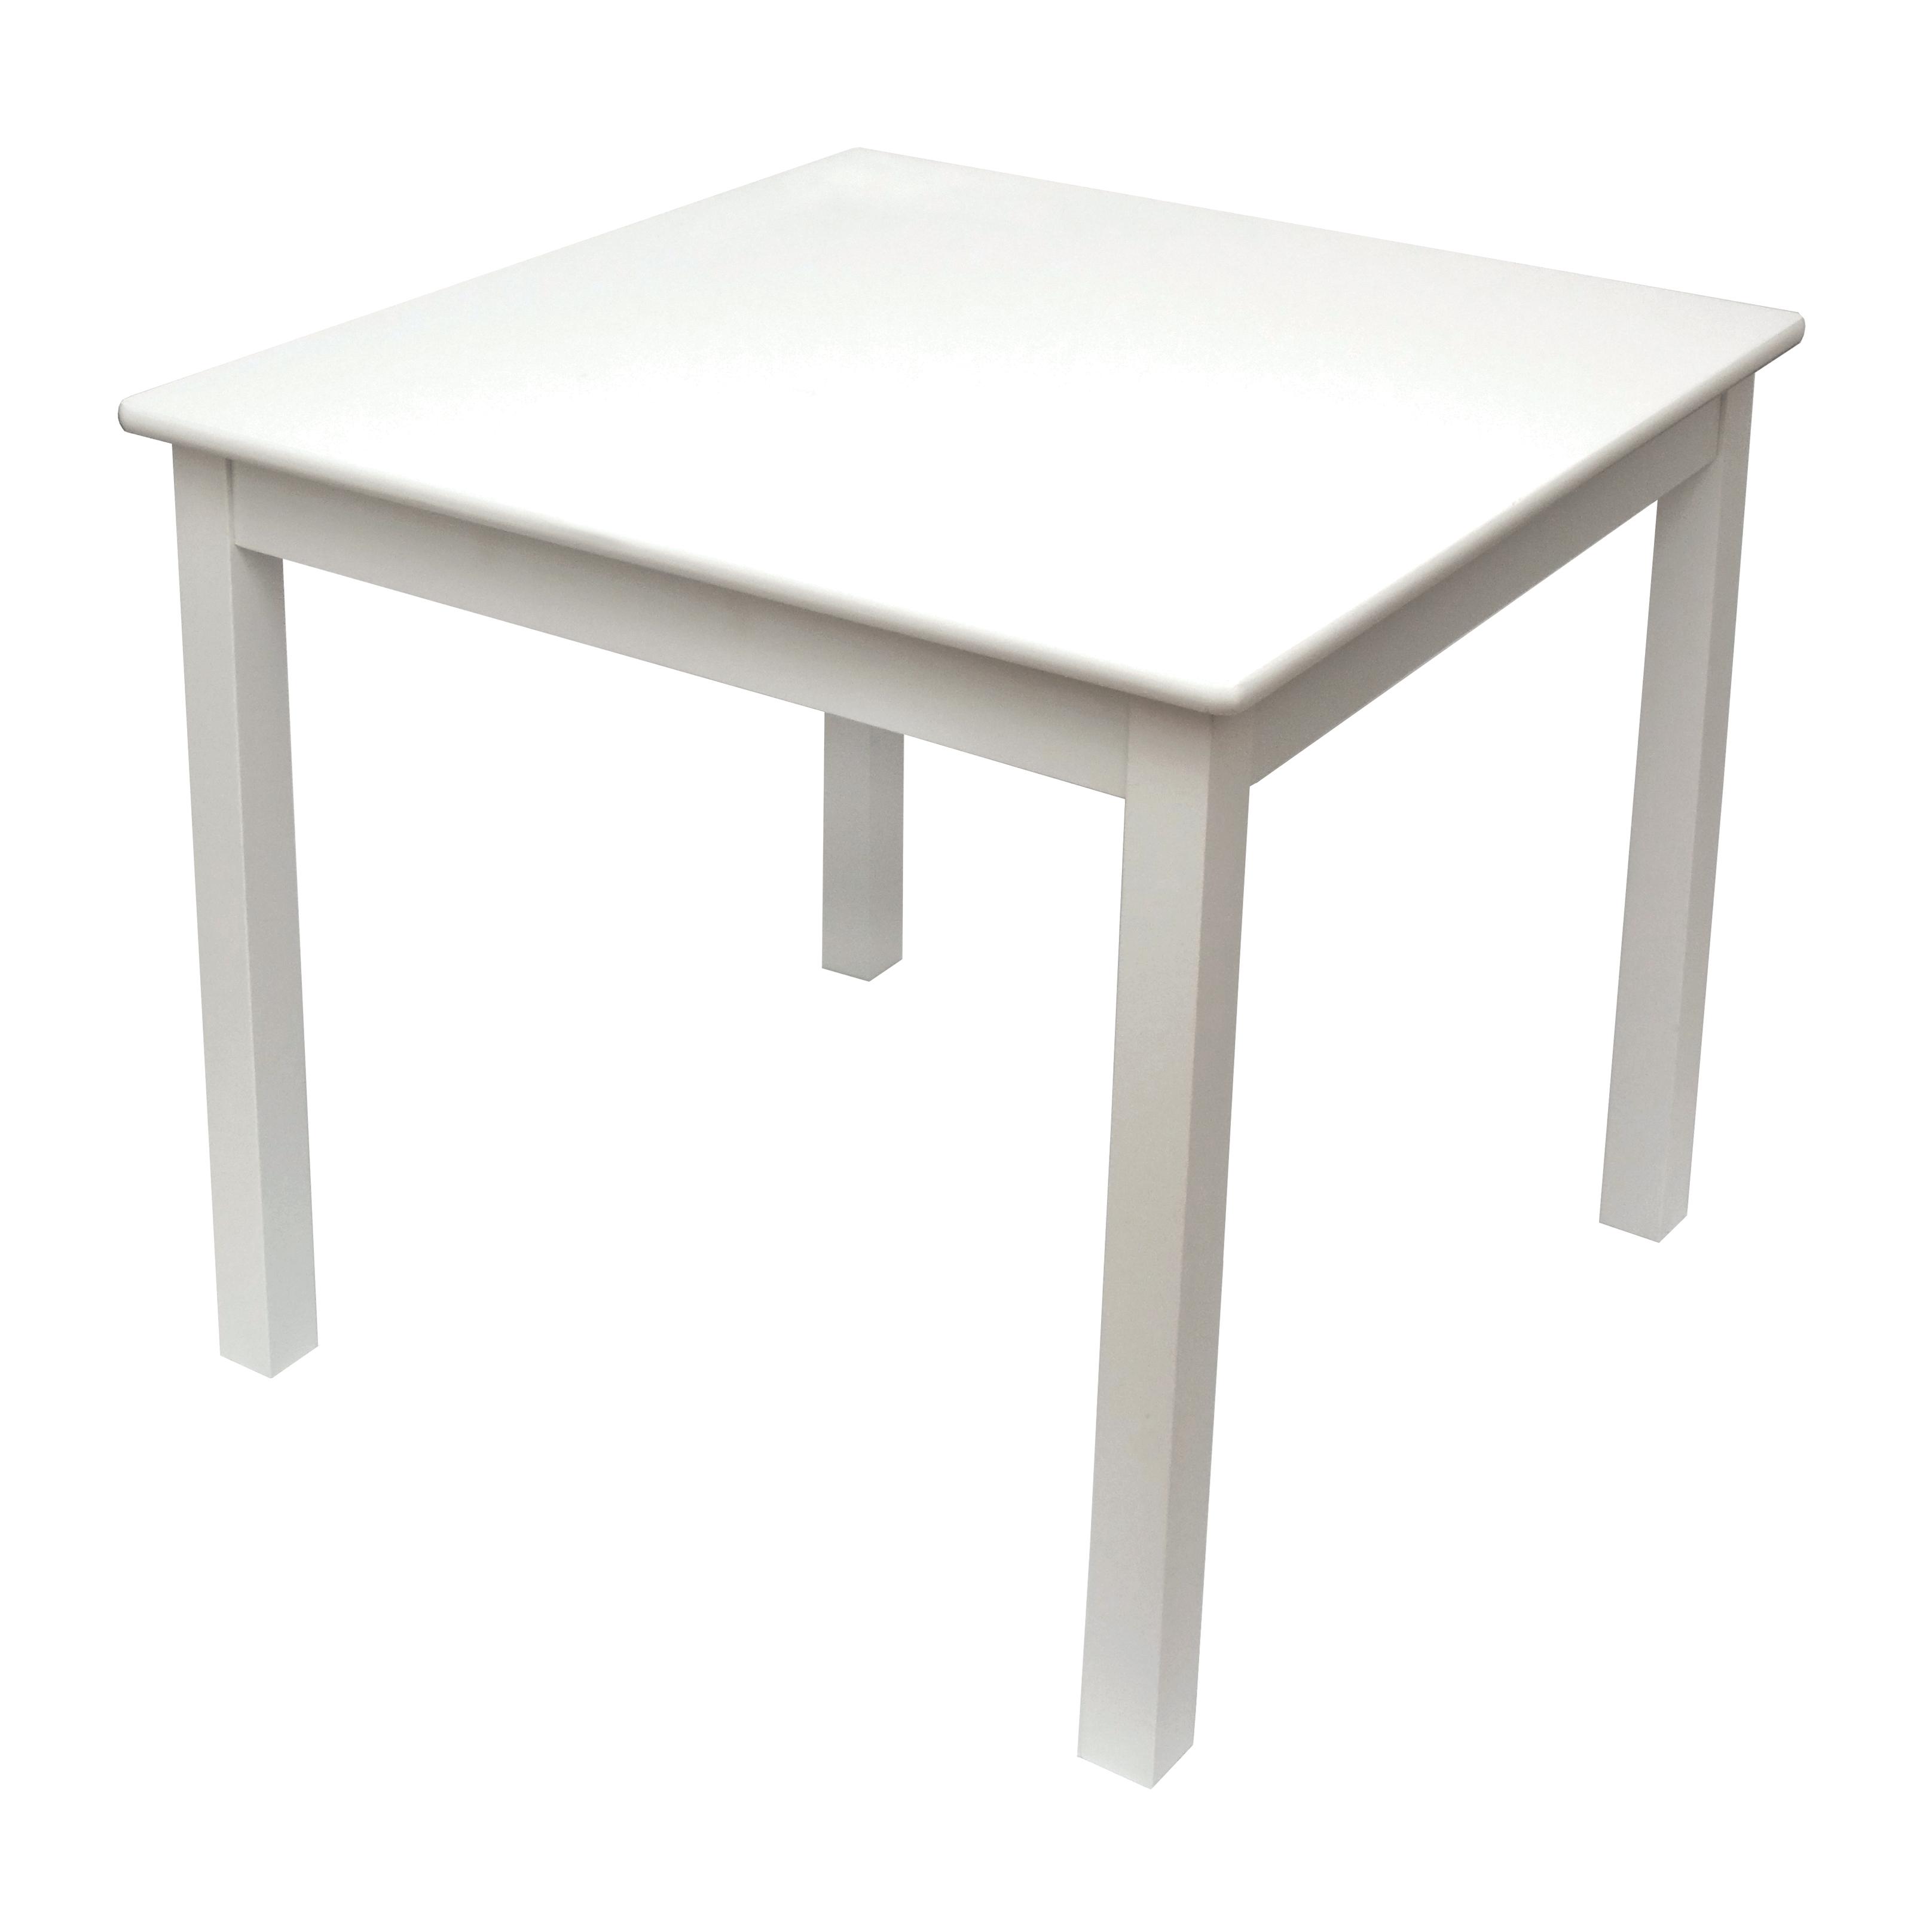 childu0027s white table | lipper international tables OUYYOYN